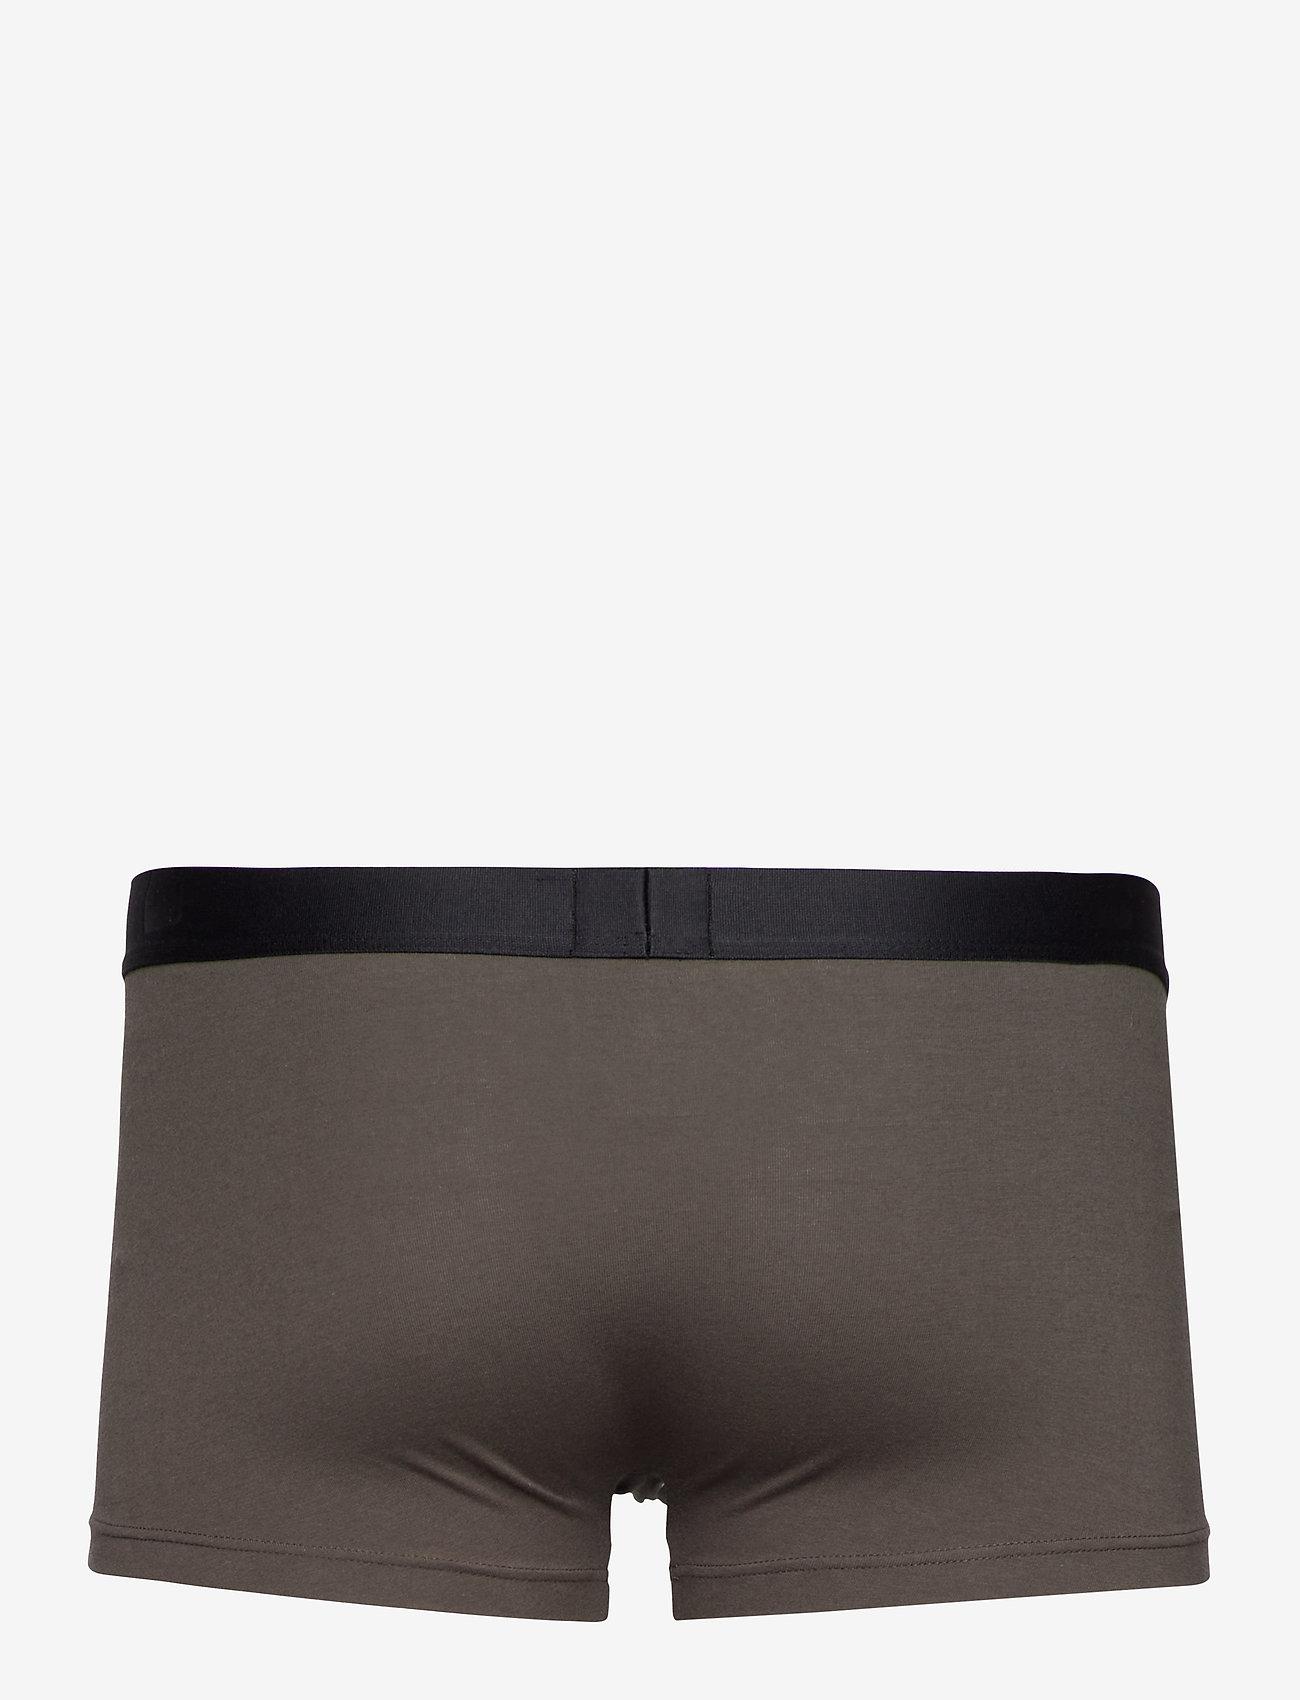 HUGO - TRUNK BROTHER PACK - boxers - black - 1